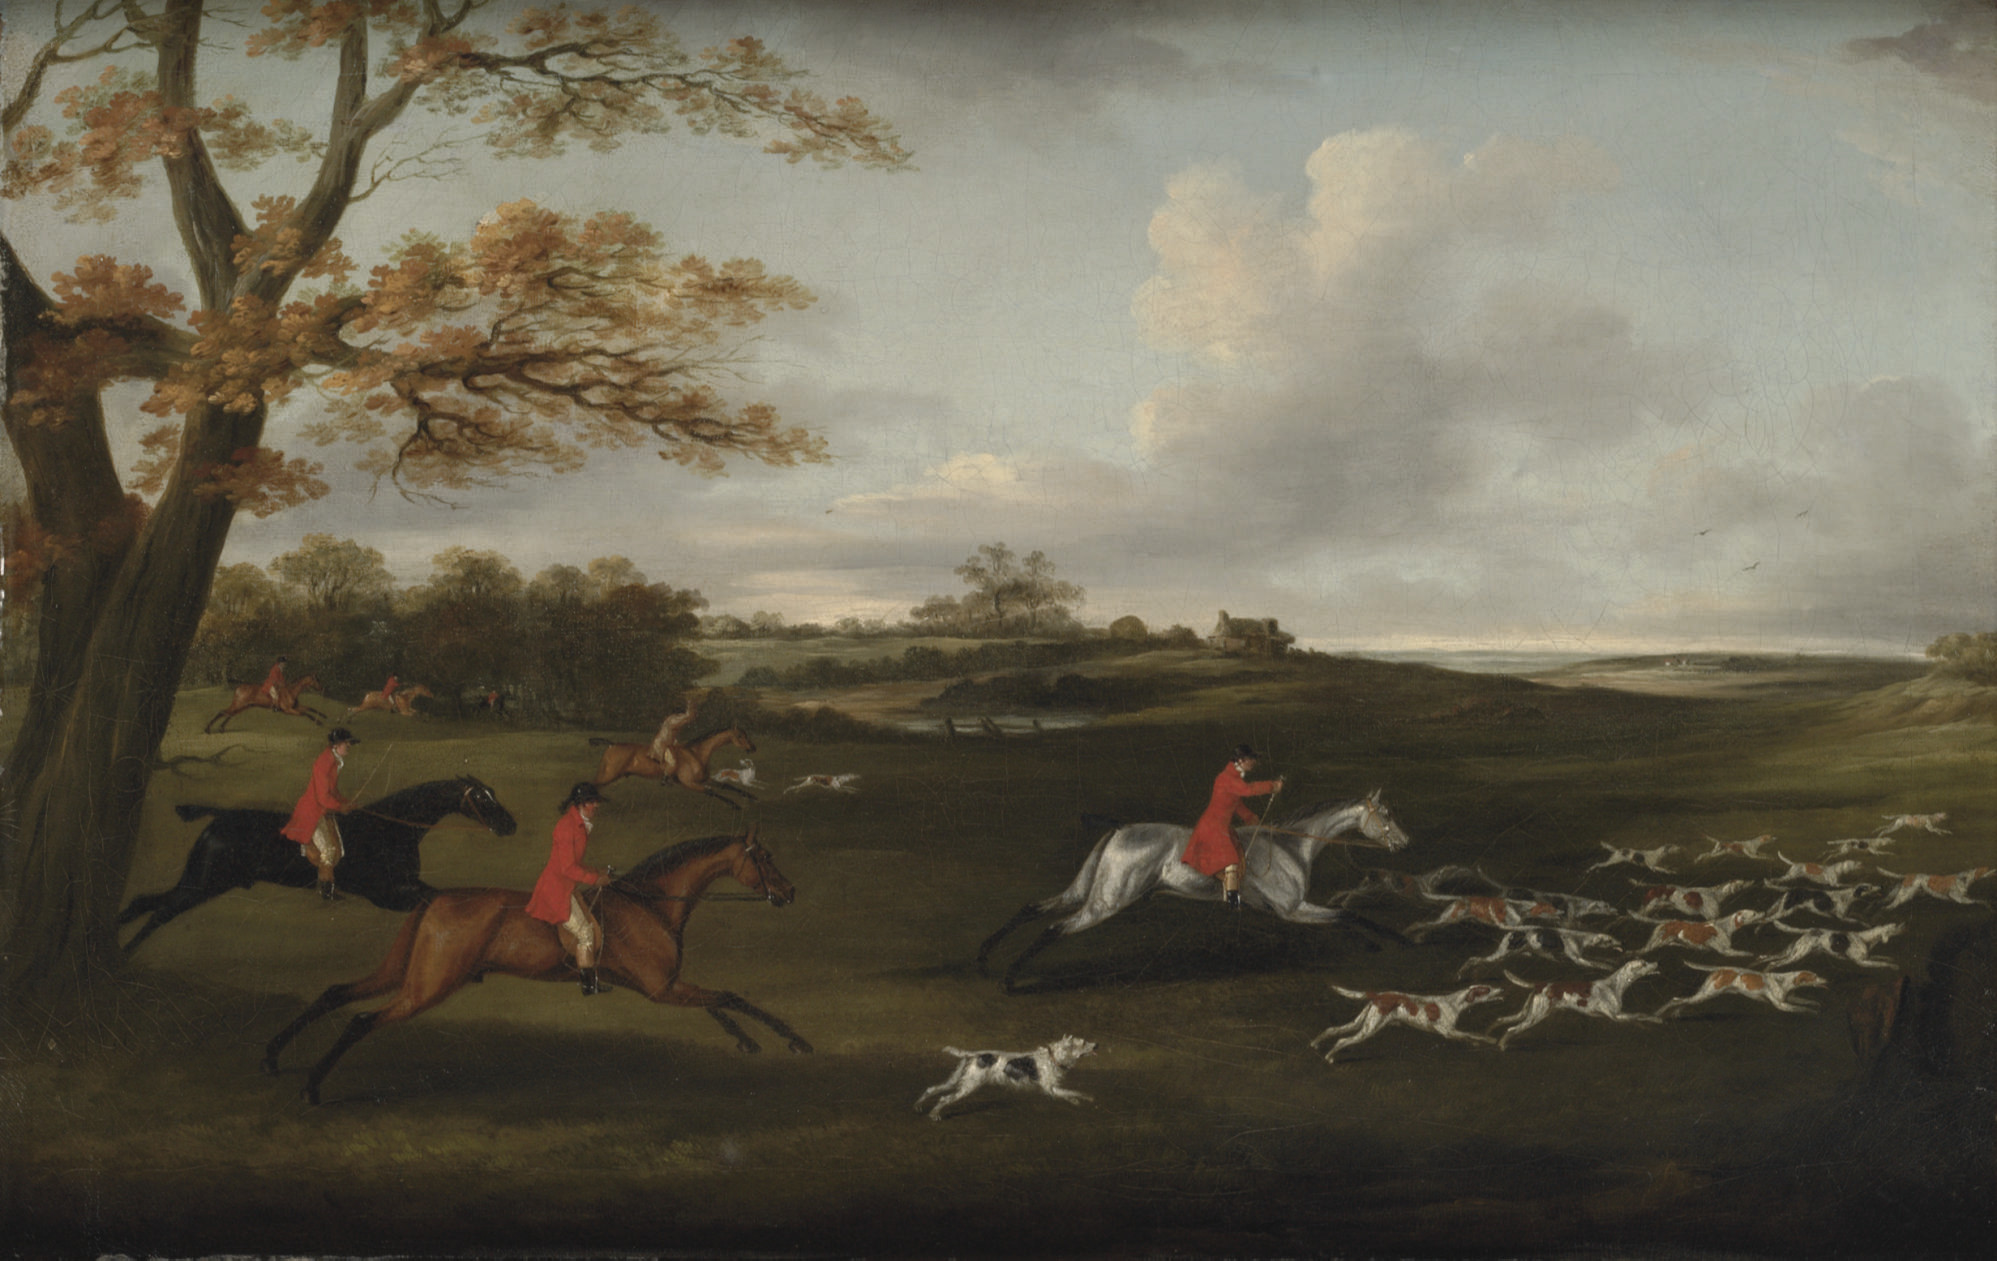 John Francis Sartorius (1734-1